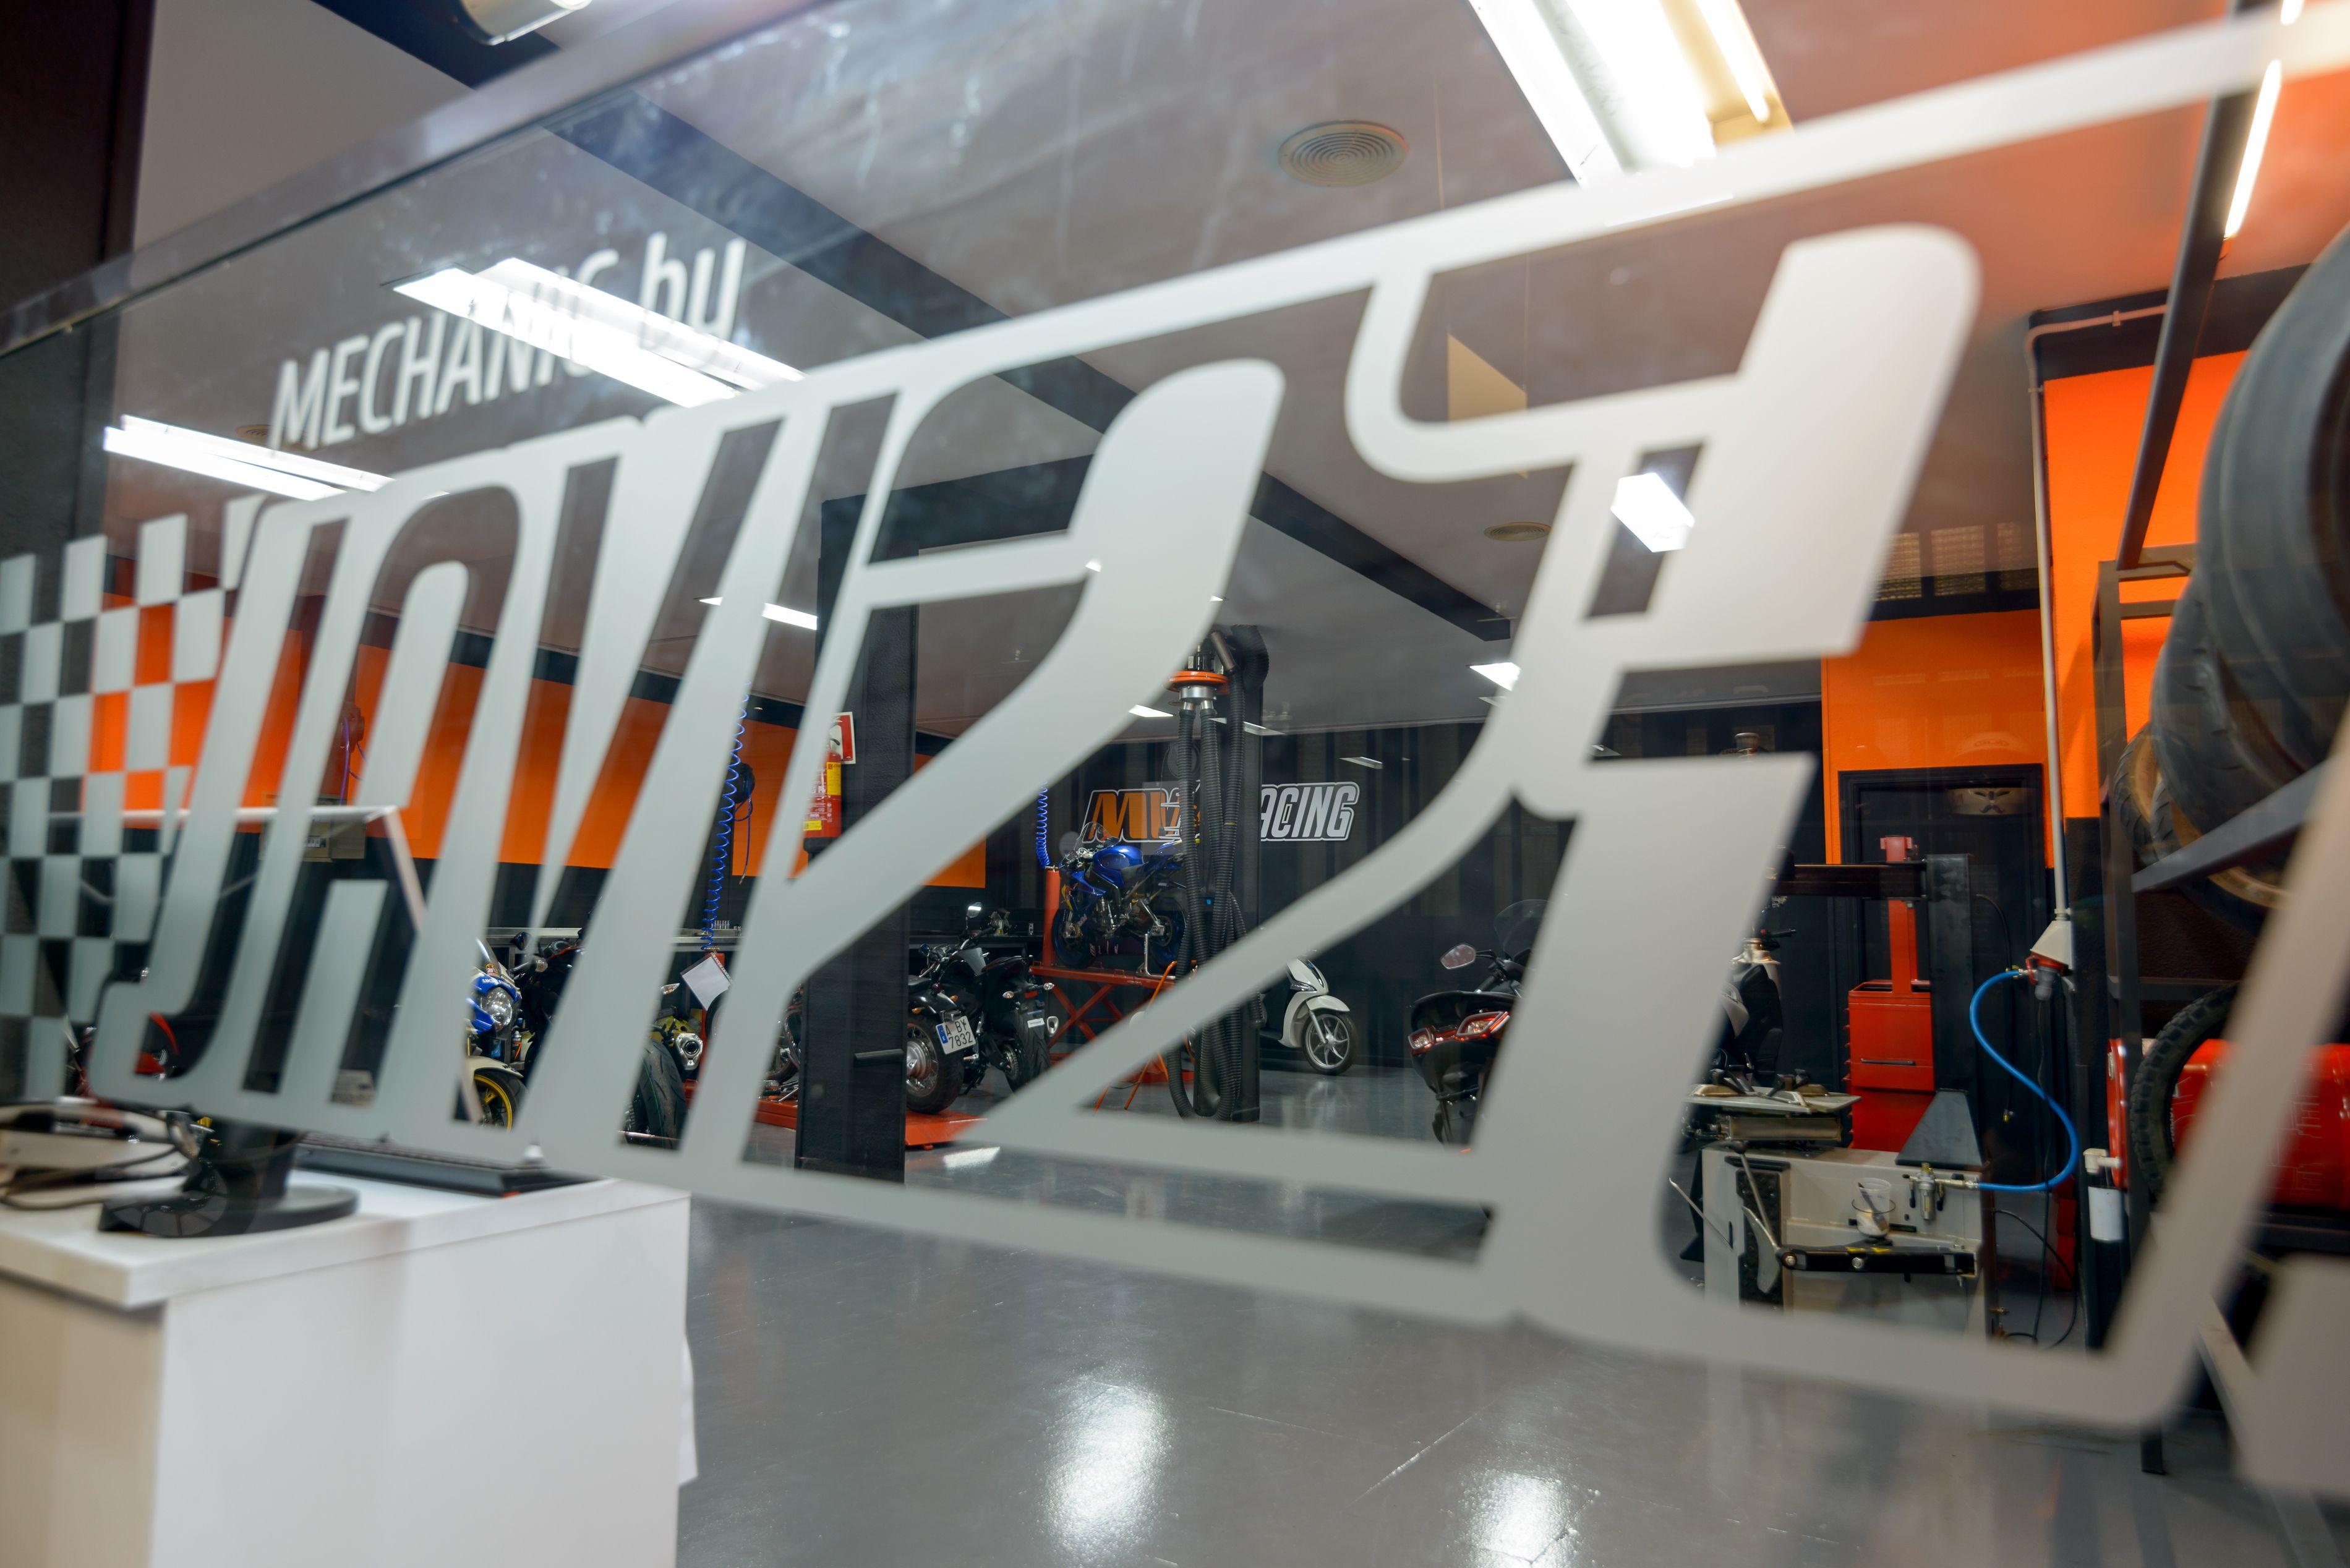 Preparación de motos para competición en Alcobendas